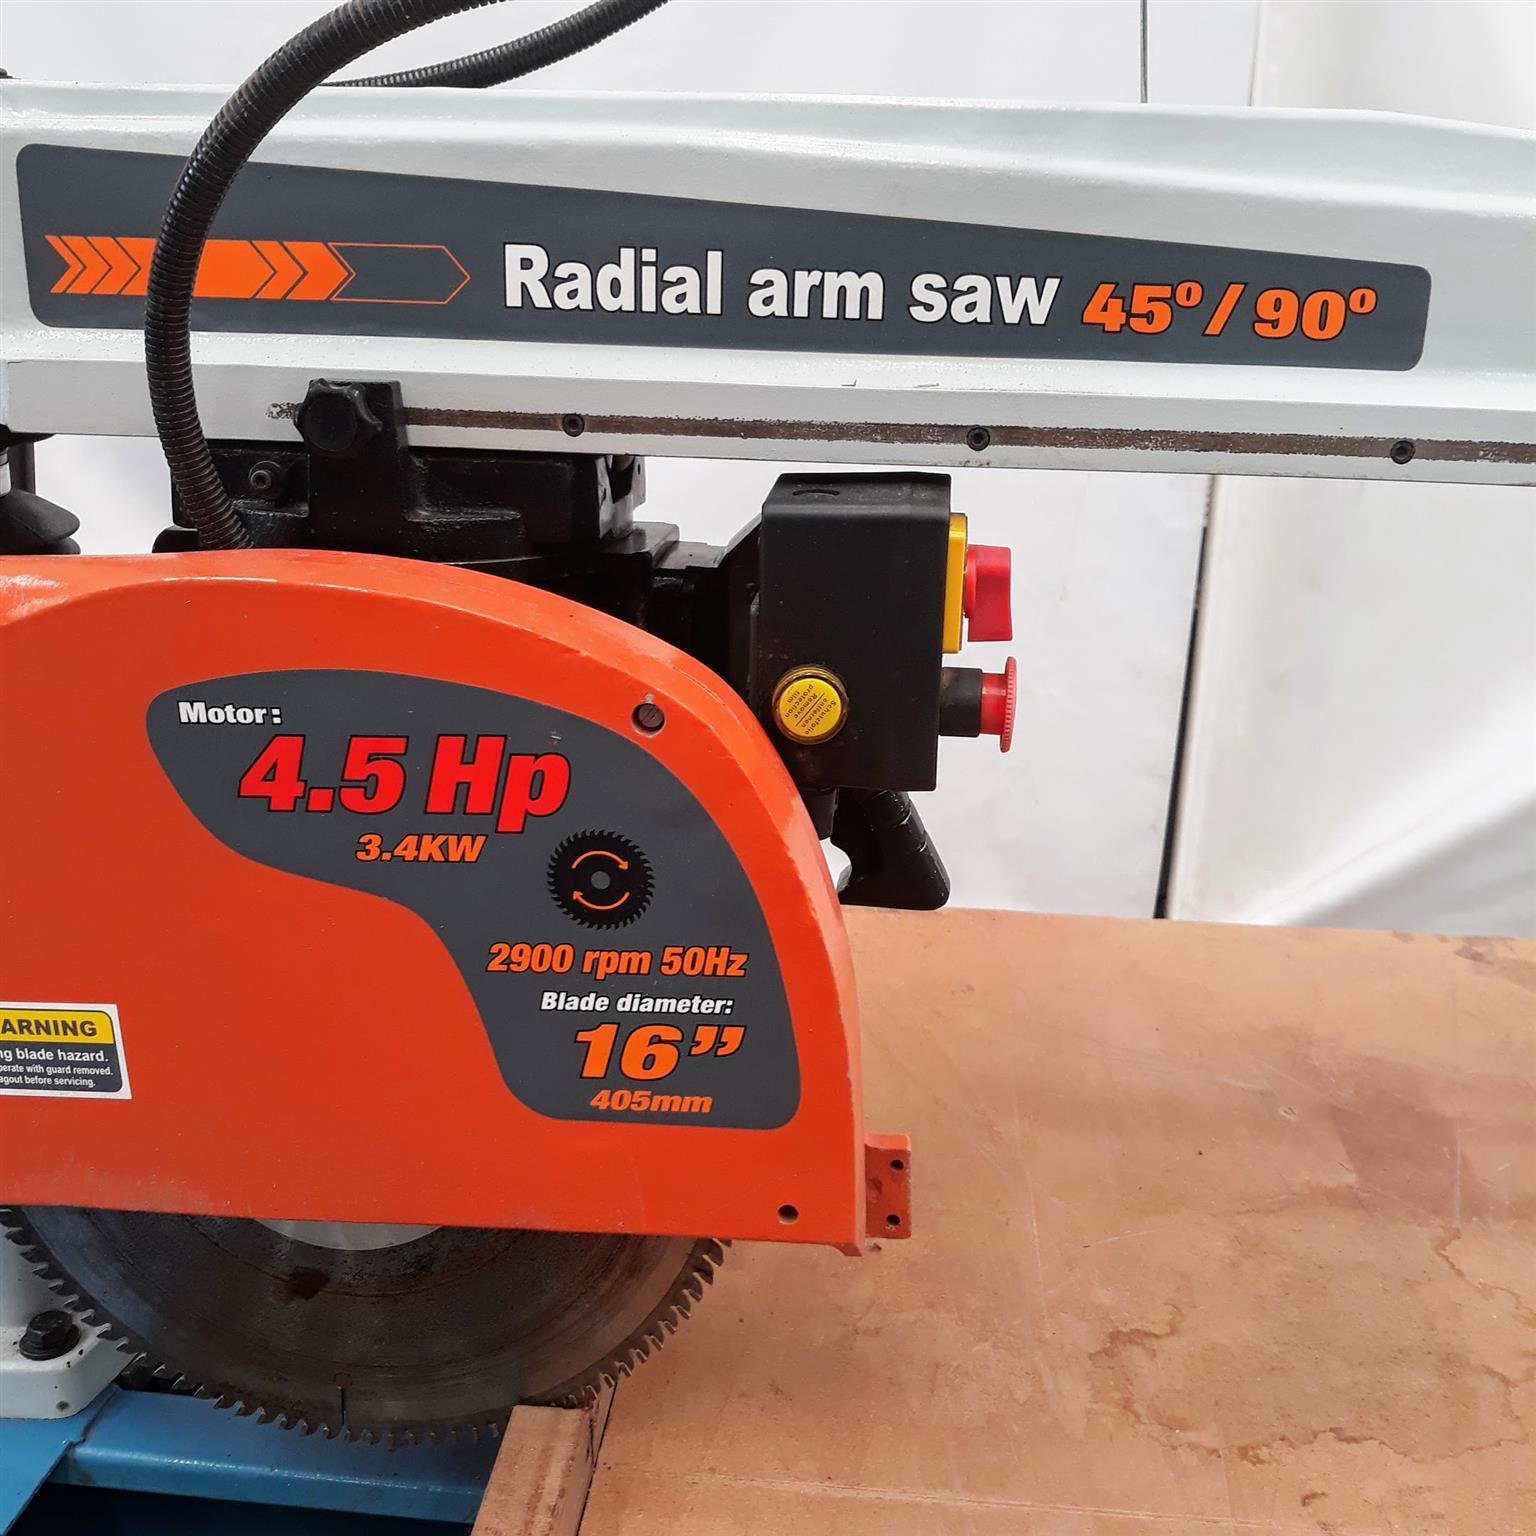 IWM BS999 Radial Arm Saw